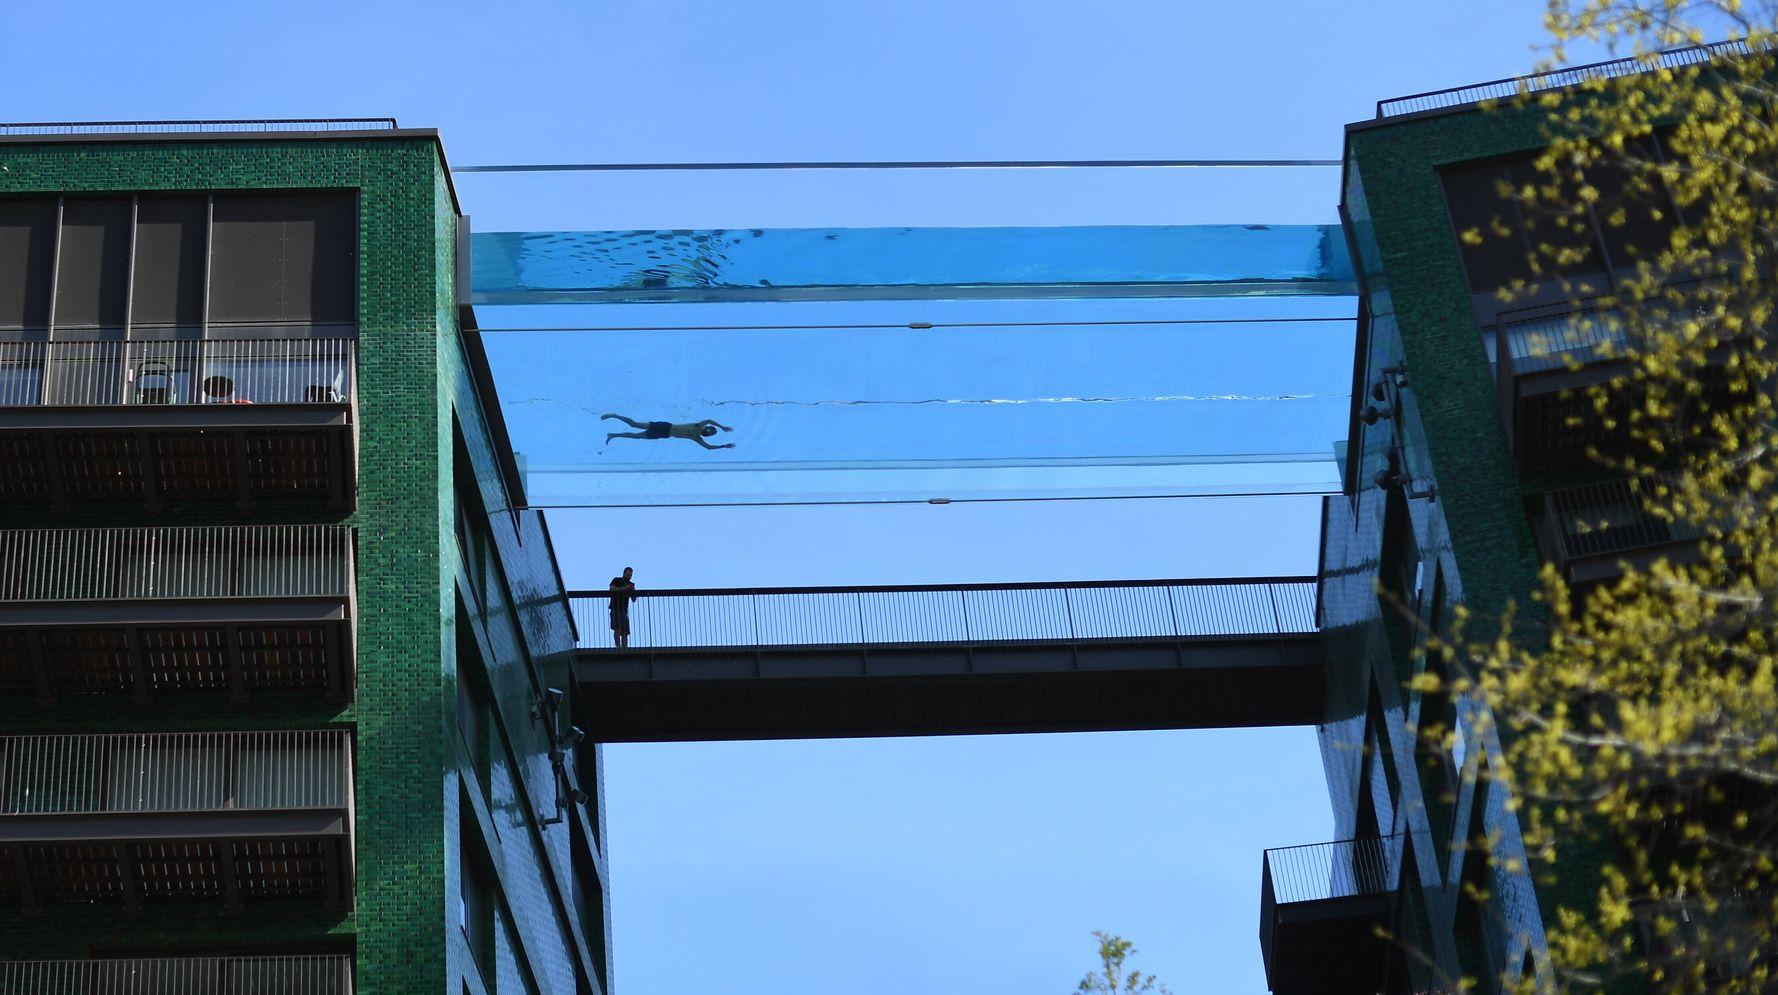 London's New See-Through Skyscraper Pool Has <b>Twitter</b> Users Saying 'Hell No!' thumbnail